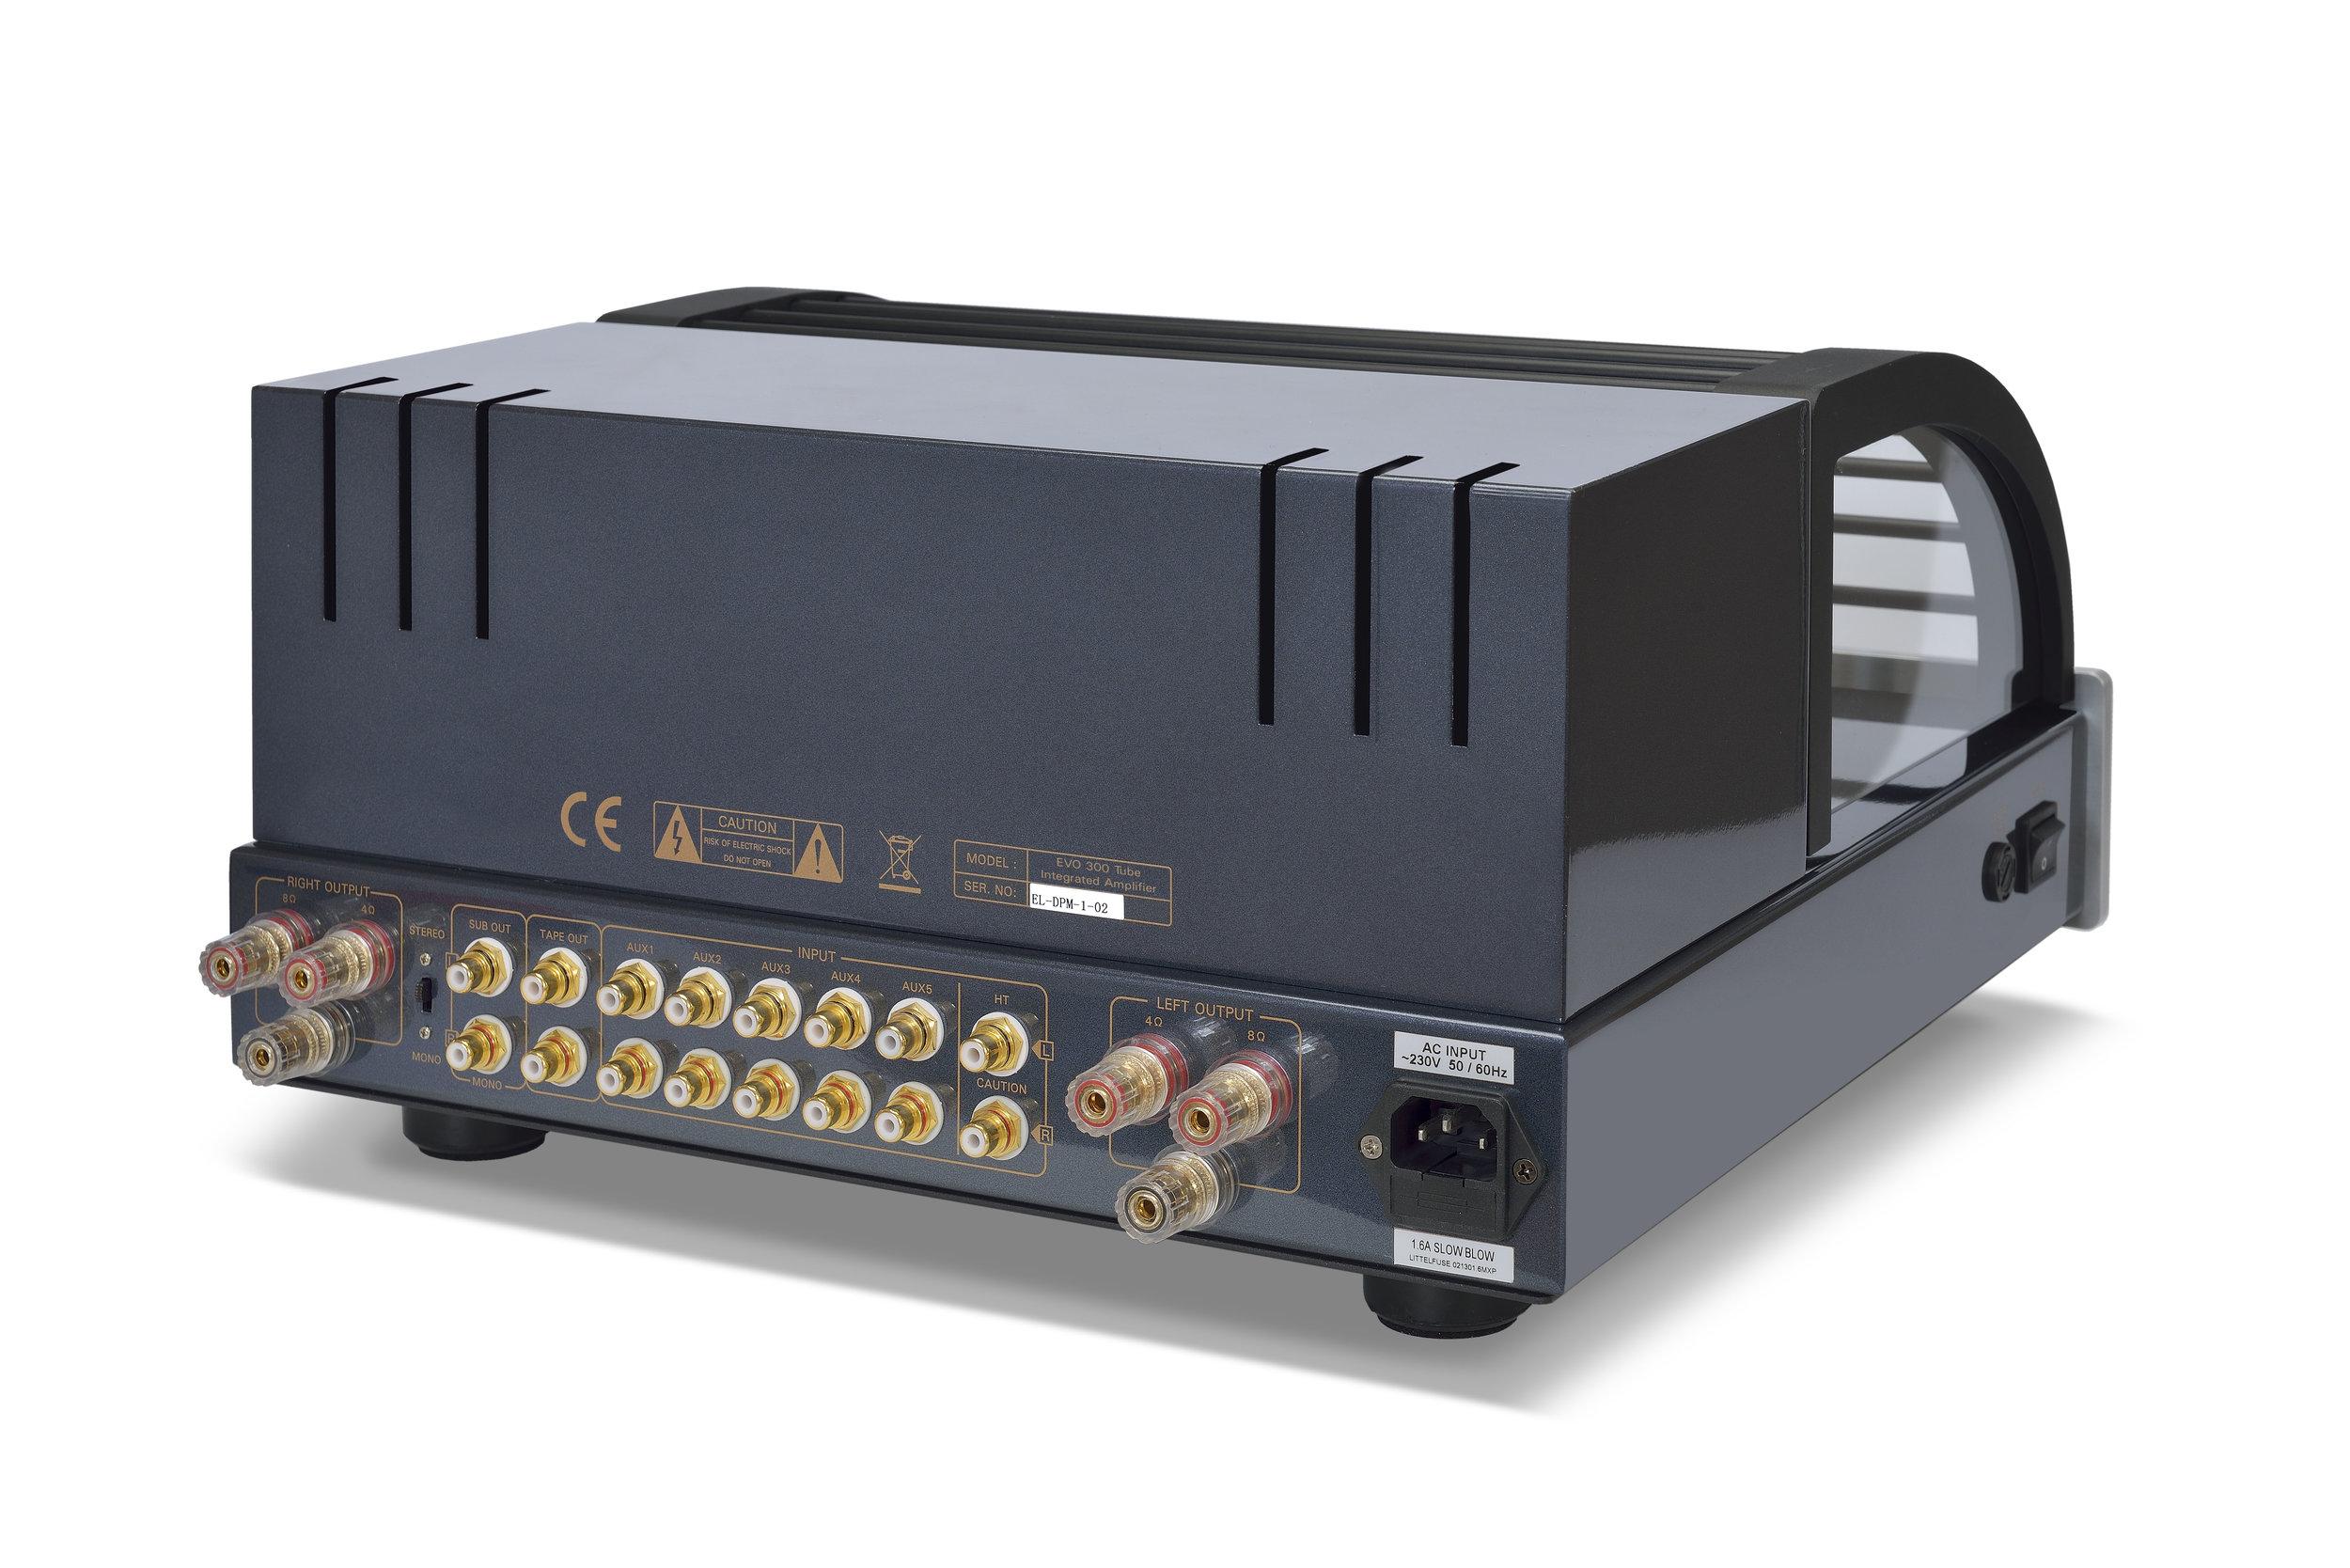 048b - PrimaLuna Evo 300 Tube Integrated Amplifier - silver - back - slanted - white background - kopie.jpg